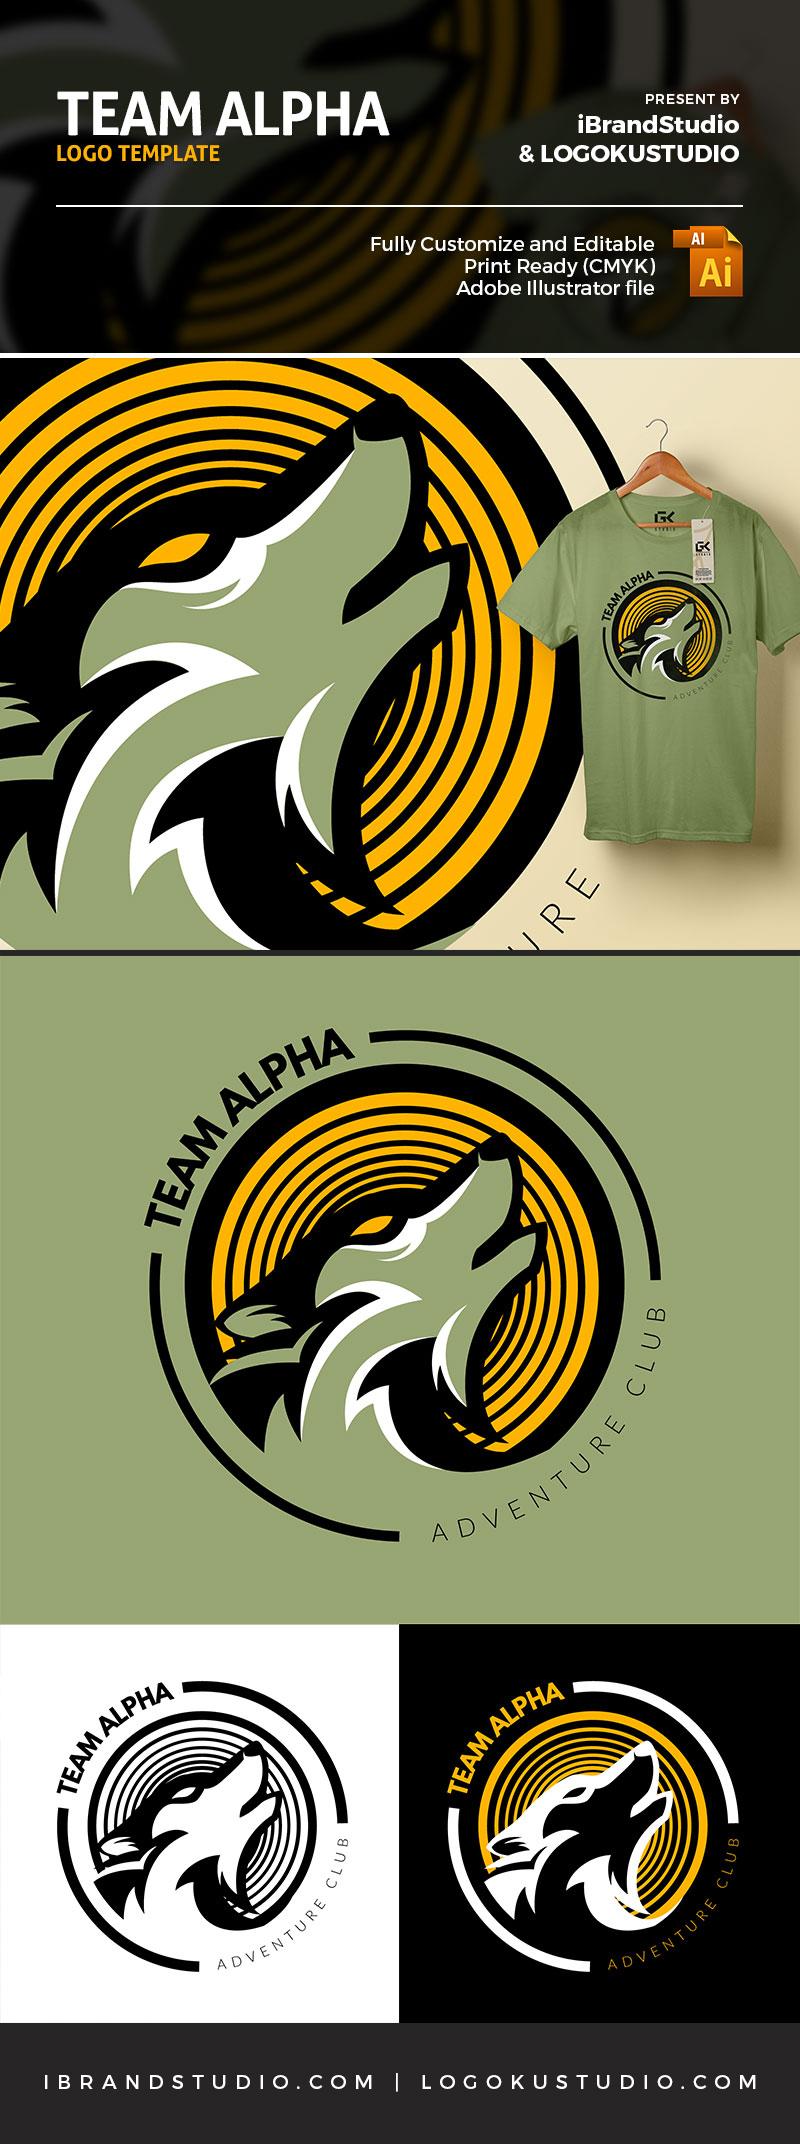 Free Team Alpha Logo Template (AI, EPS)